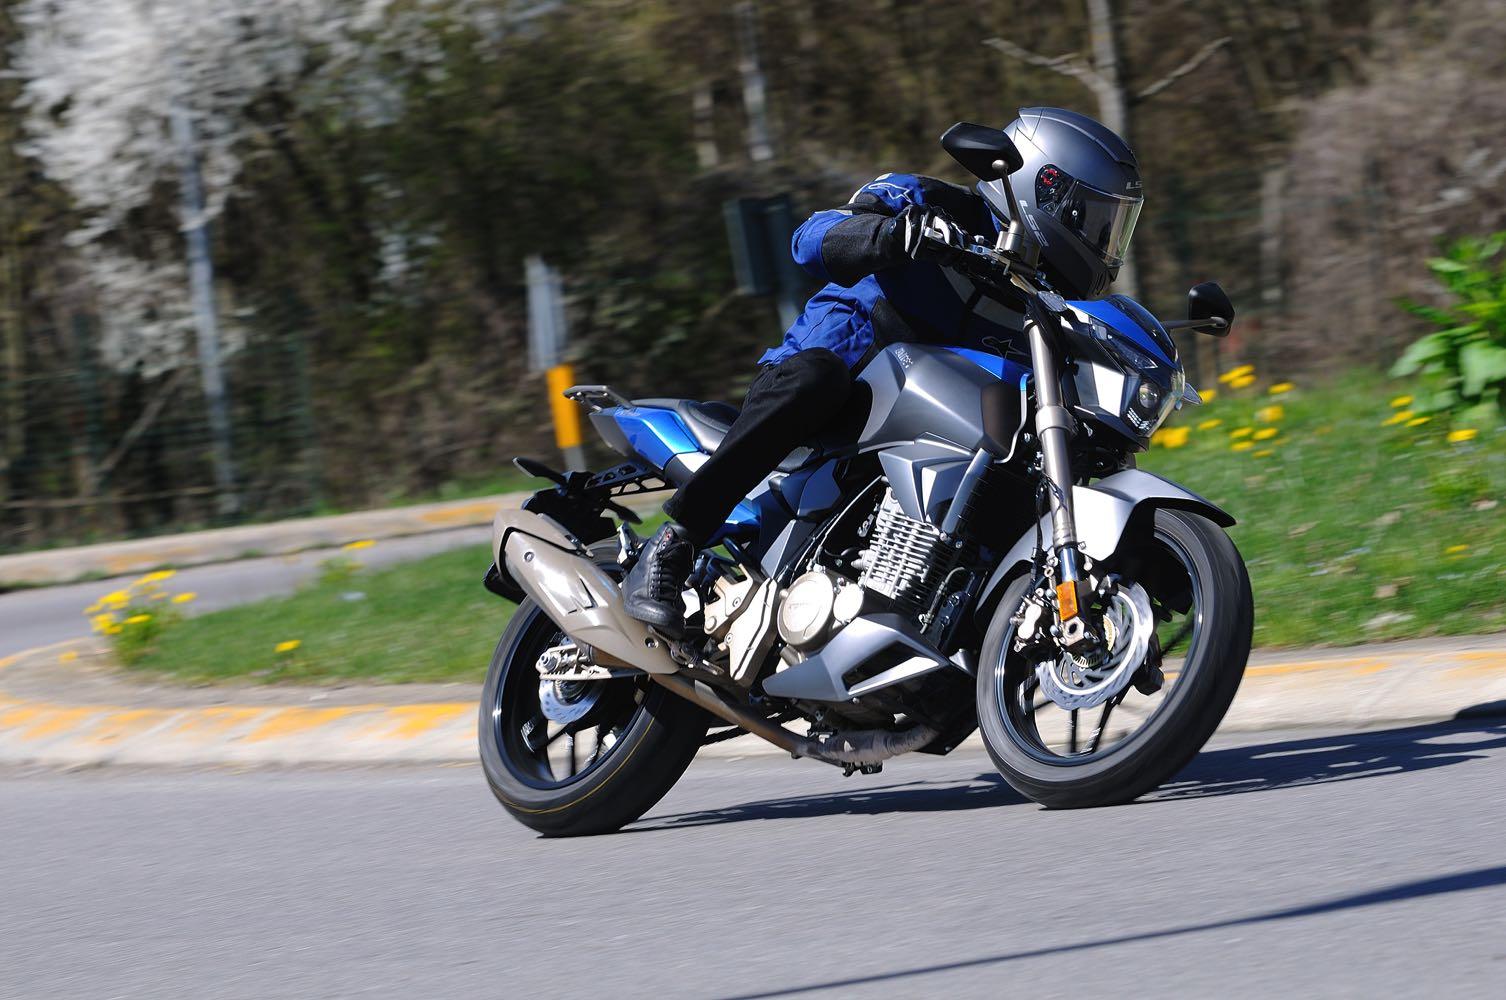 Prova Zontes ZT 250-R 2018 - InSella.it